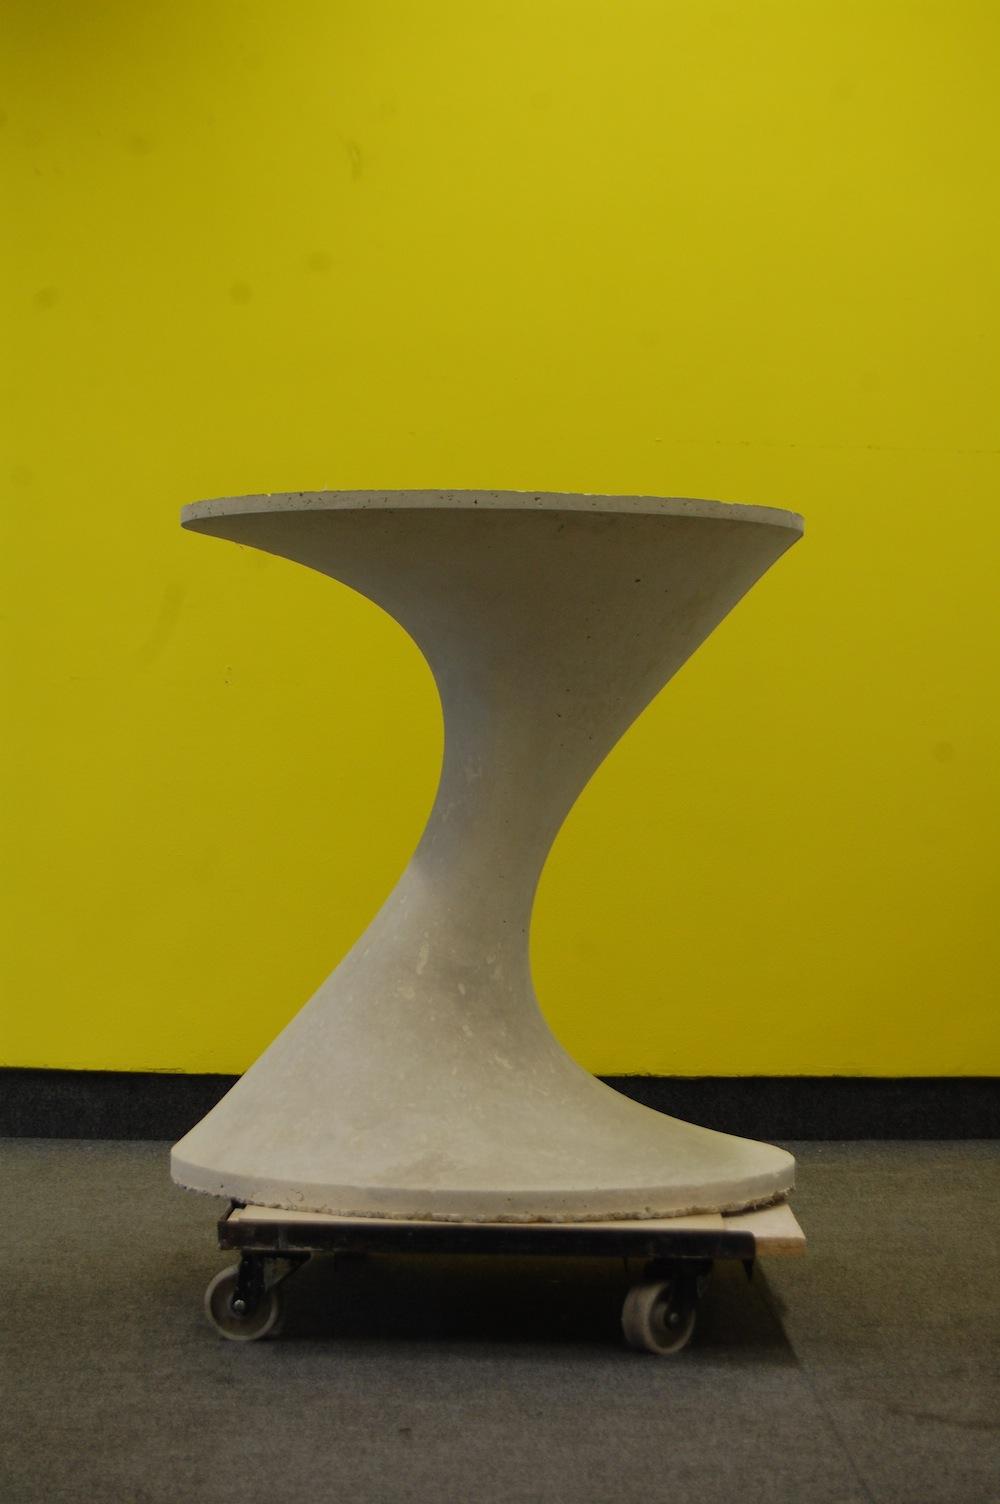 Curvy table